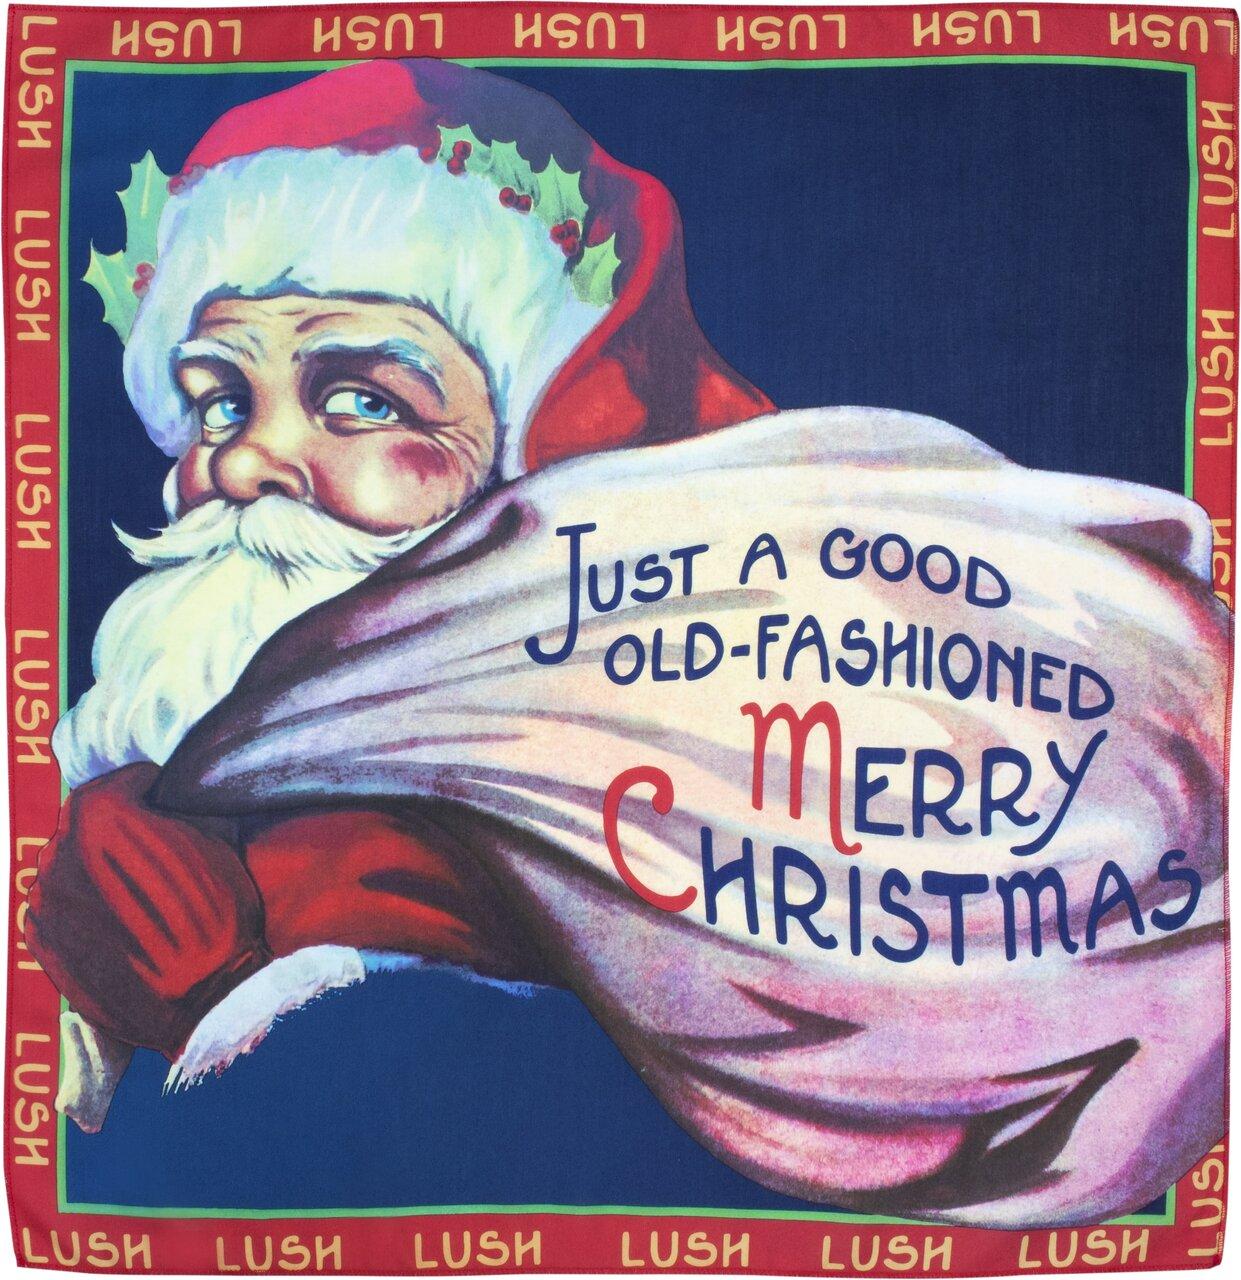 LUSH(ラッシュ) 2020 クリスマスコフレ「ジャスト ア グッド オールドファッションド メリークリスマス ノットラップ」